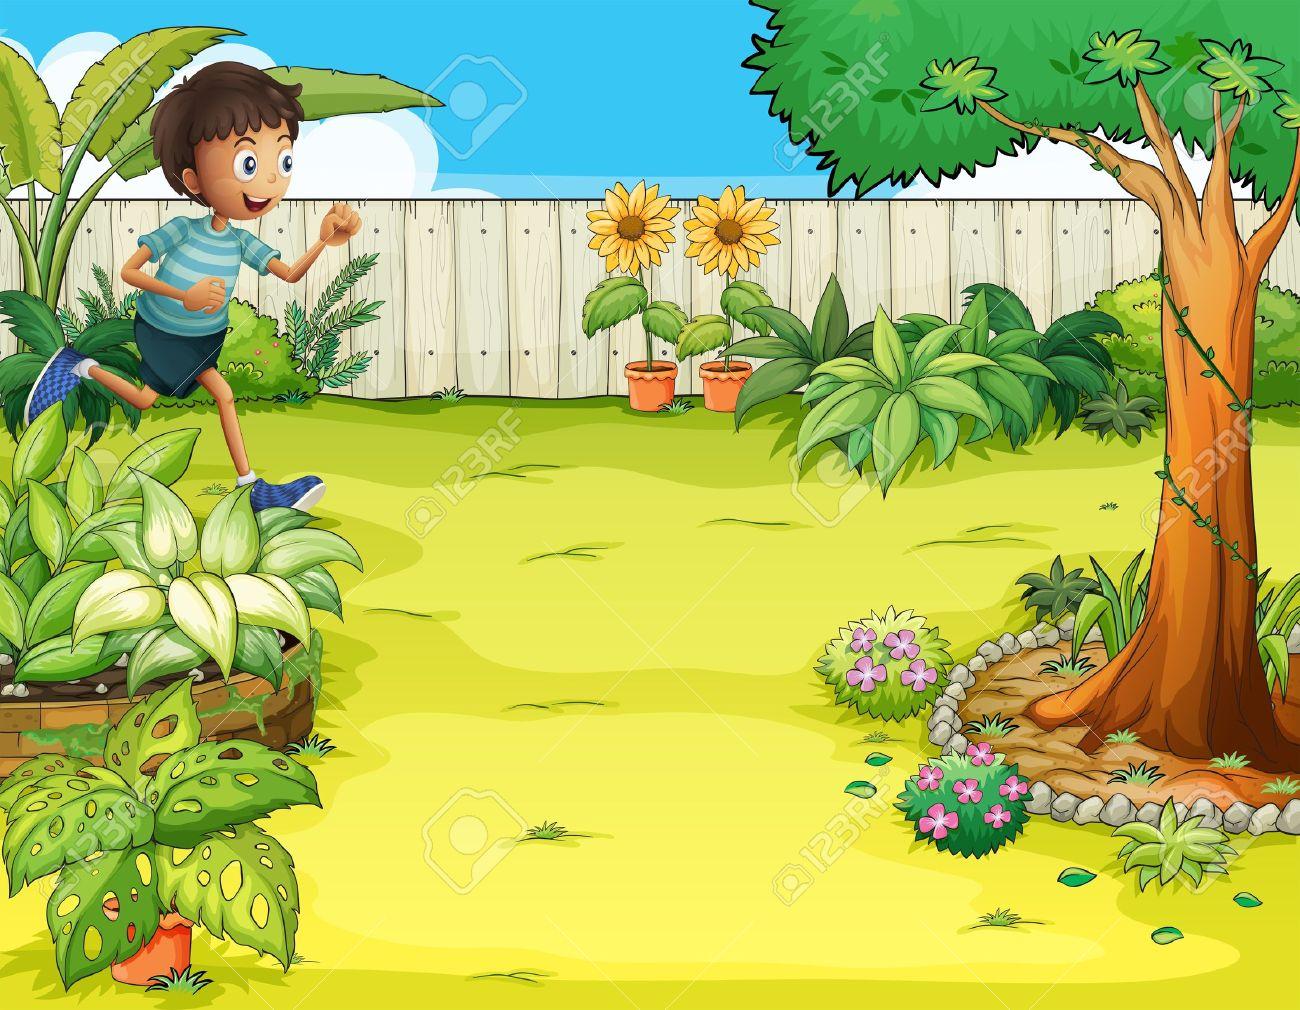 Illustration Of A Boy Running At The Backyard Royalty Free.